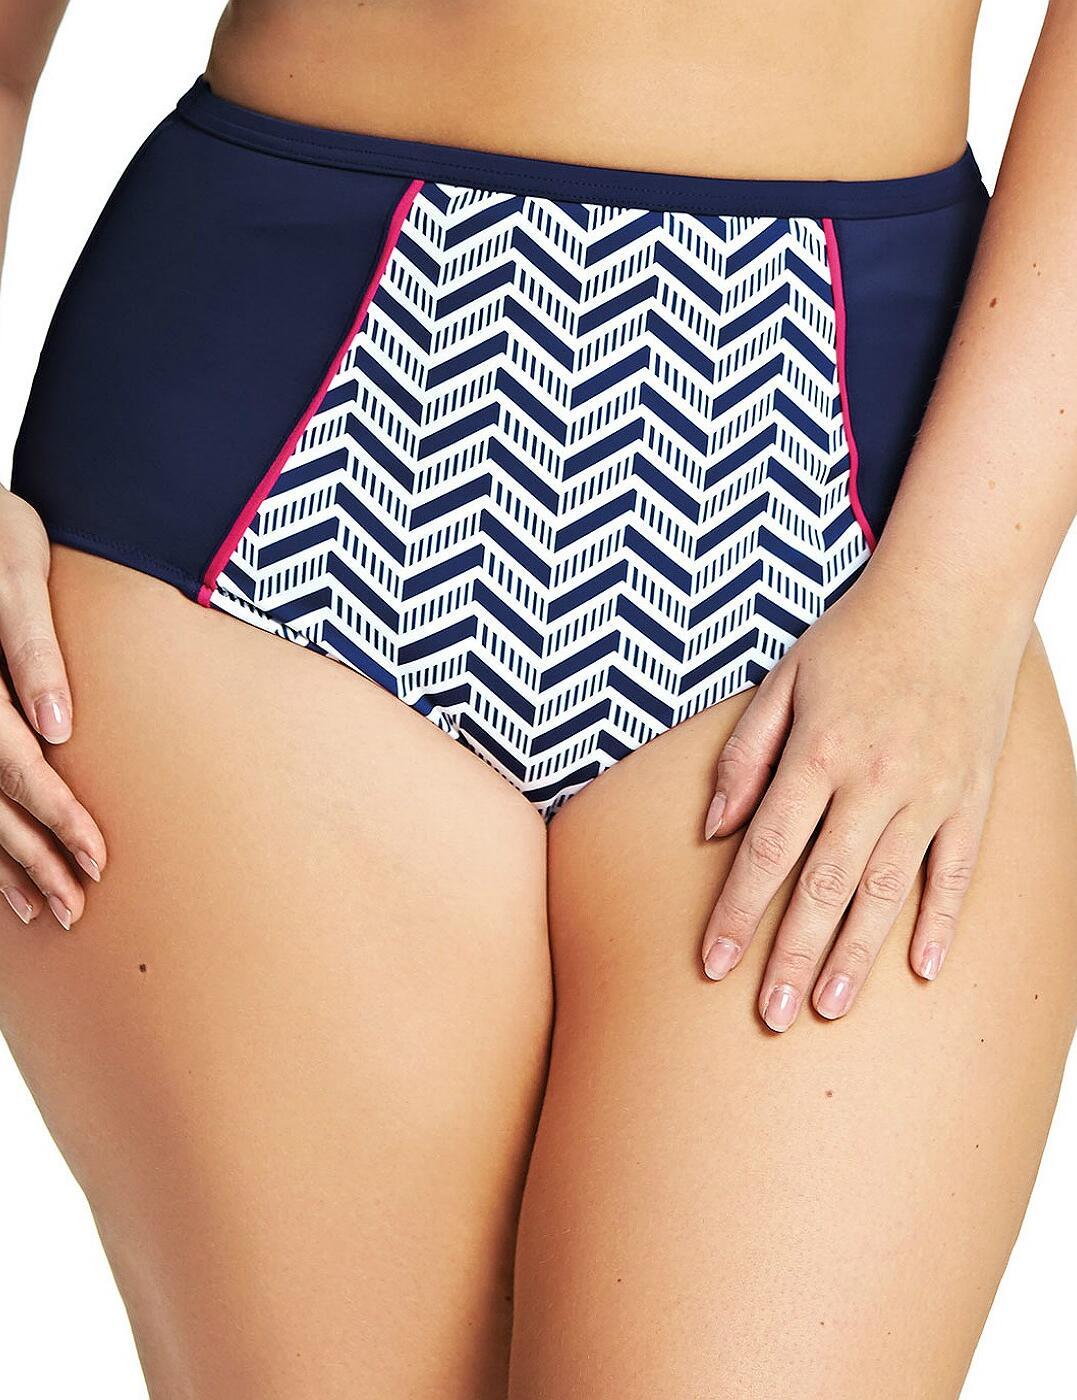 7453 Elomi Chevron Classic Bikini Brief - 7453 Midnight